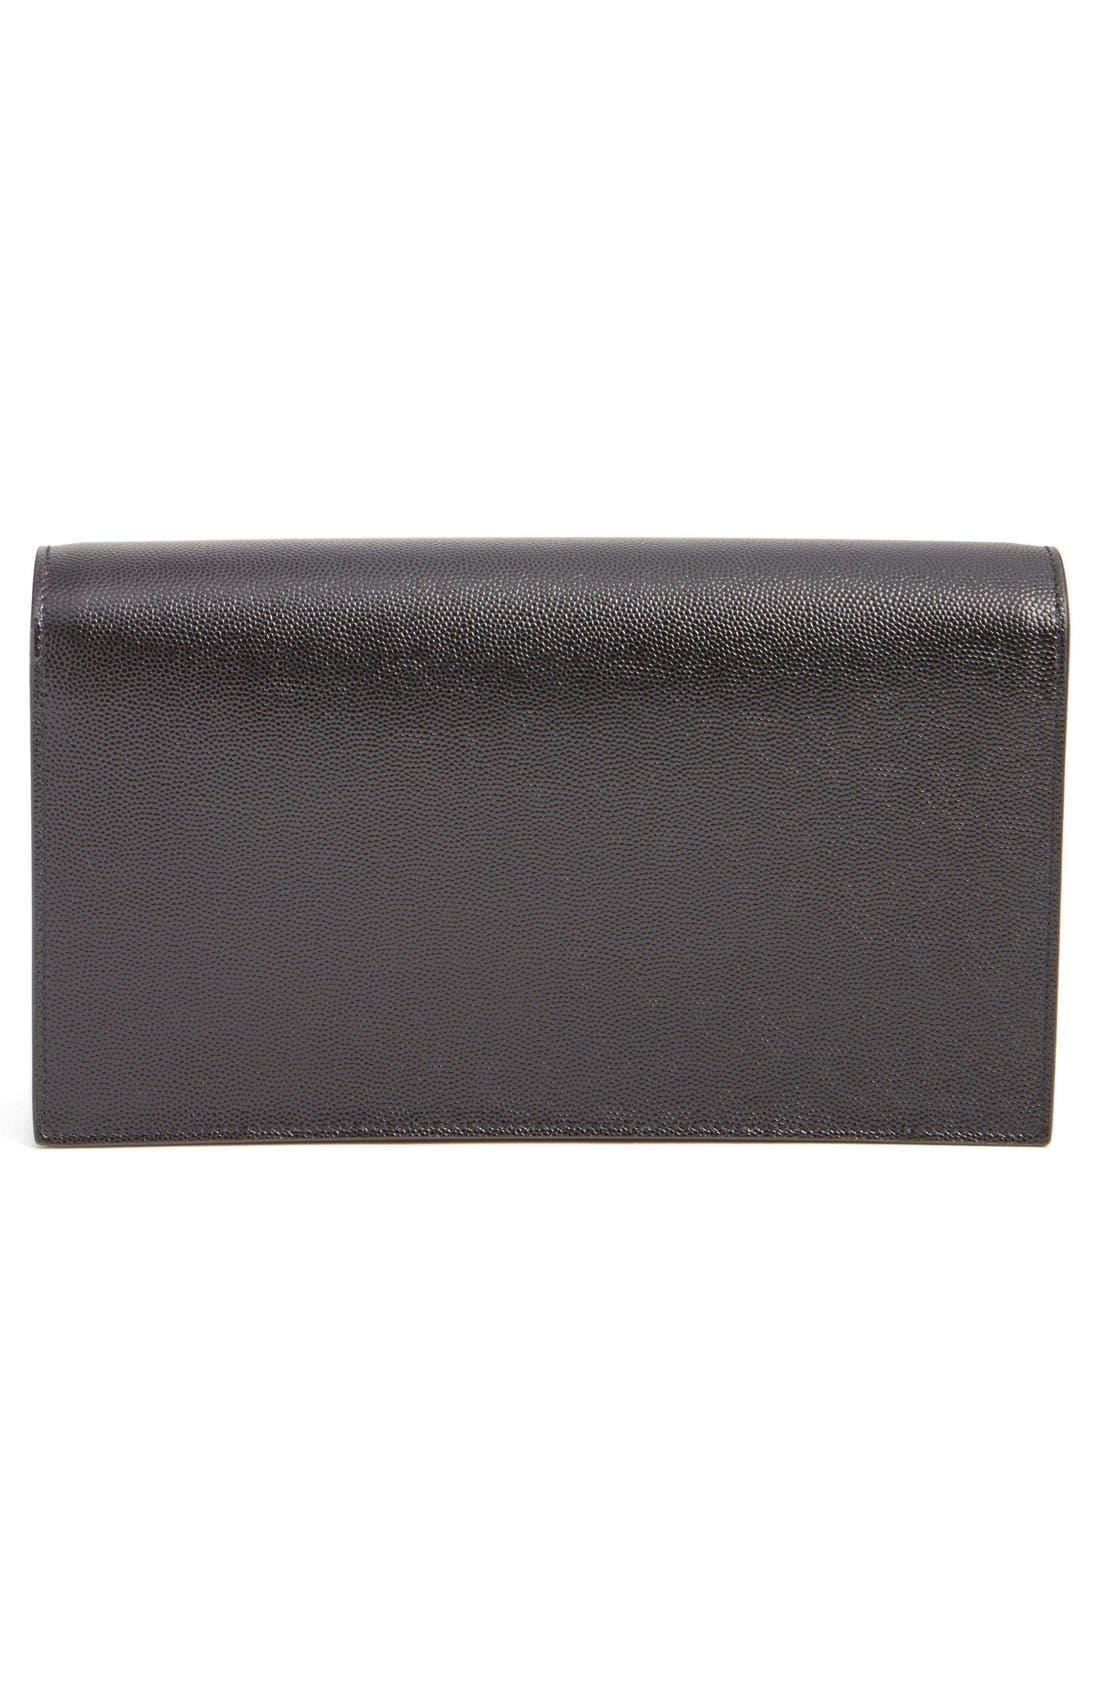 Alternate Image 2  - Saint Laurent 'Kate' Pebbled Calfskin Leather Clutch